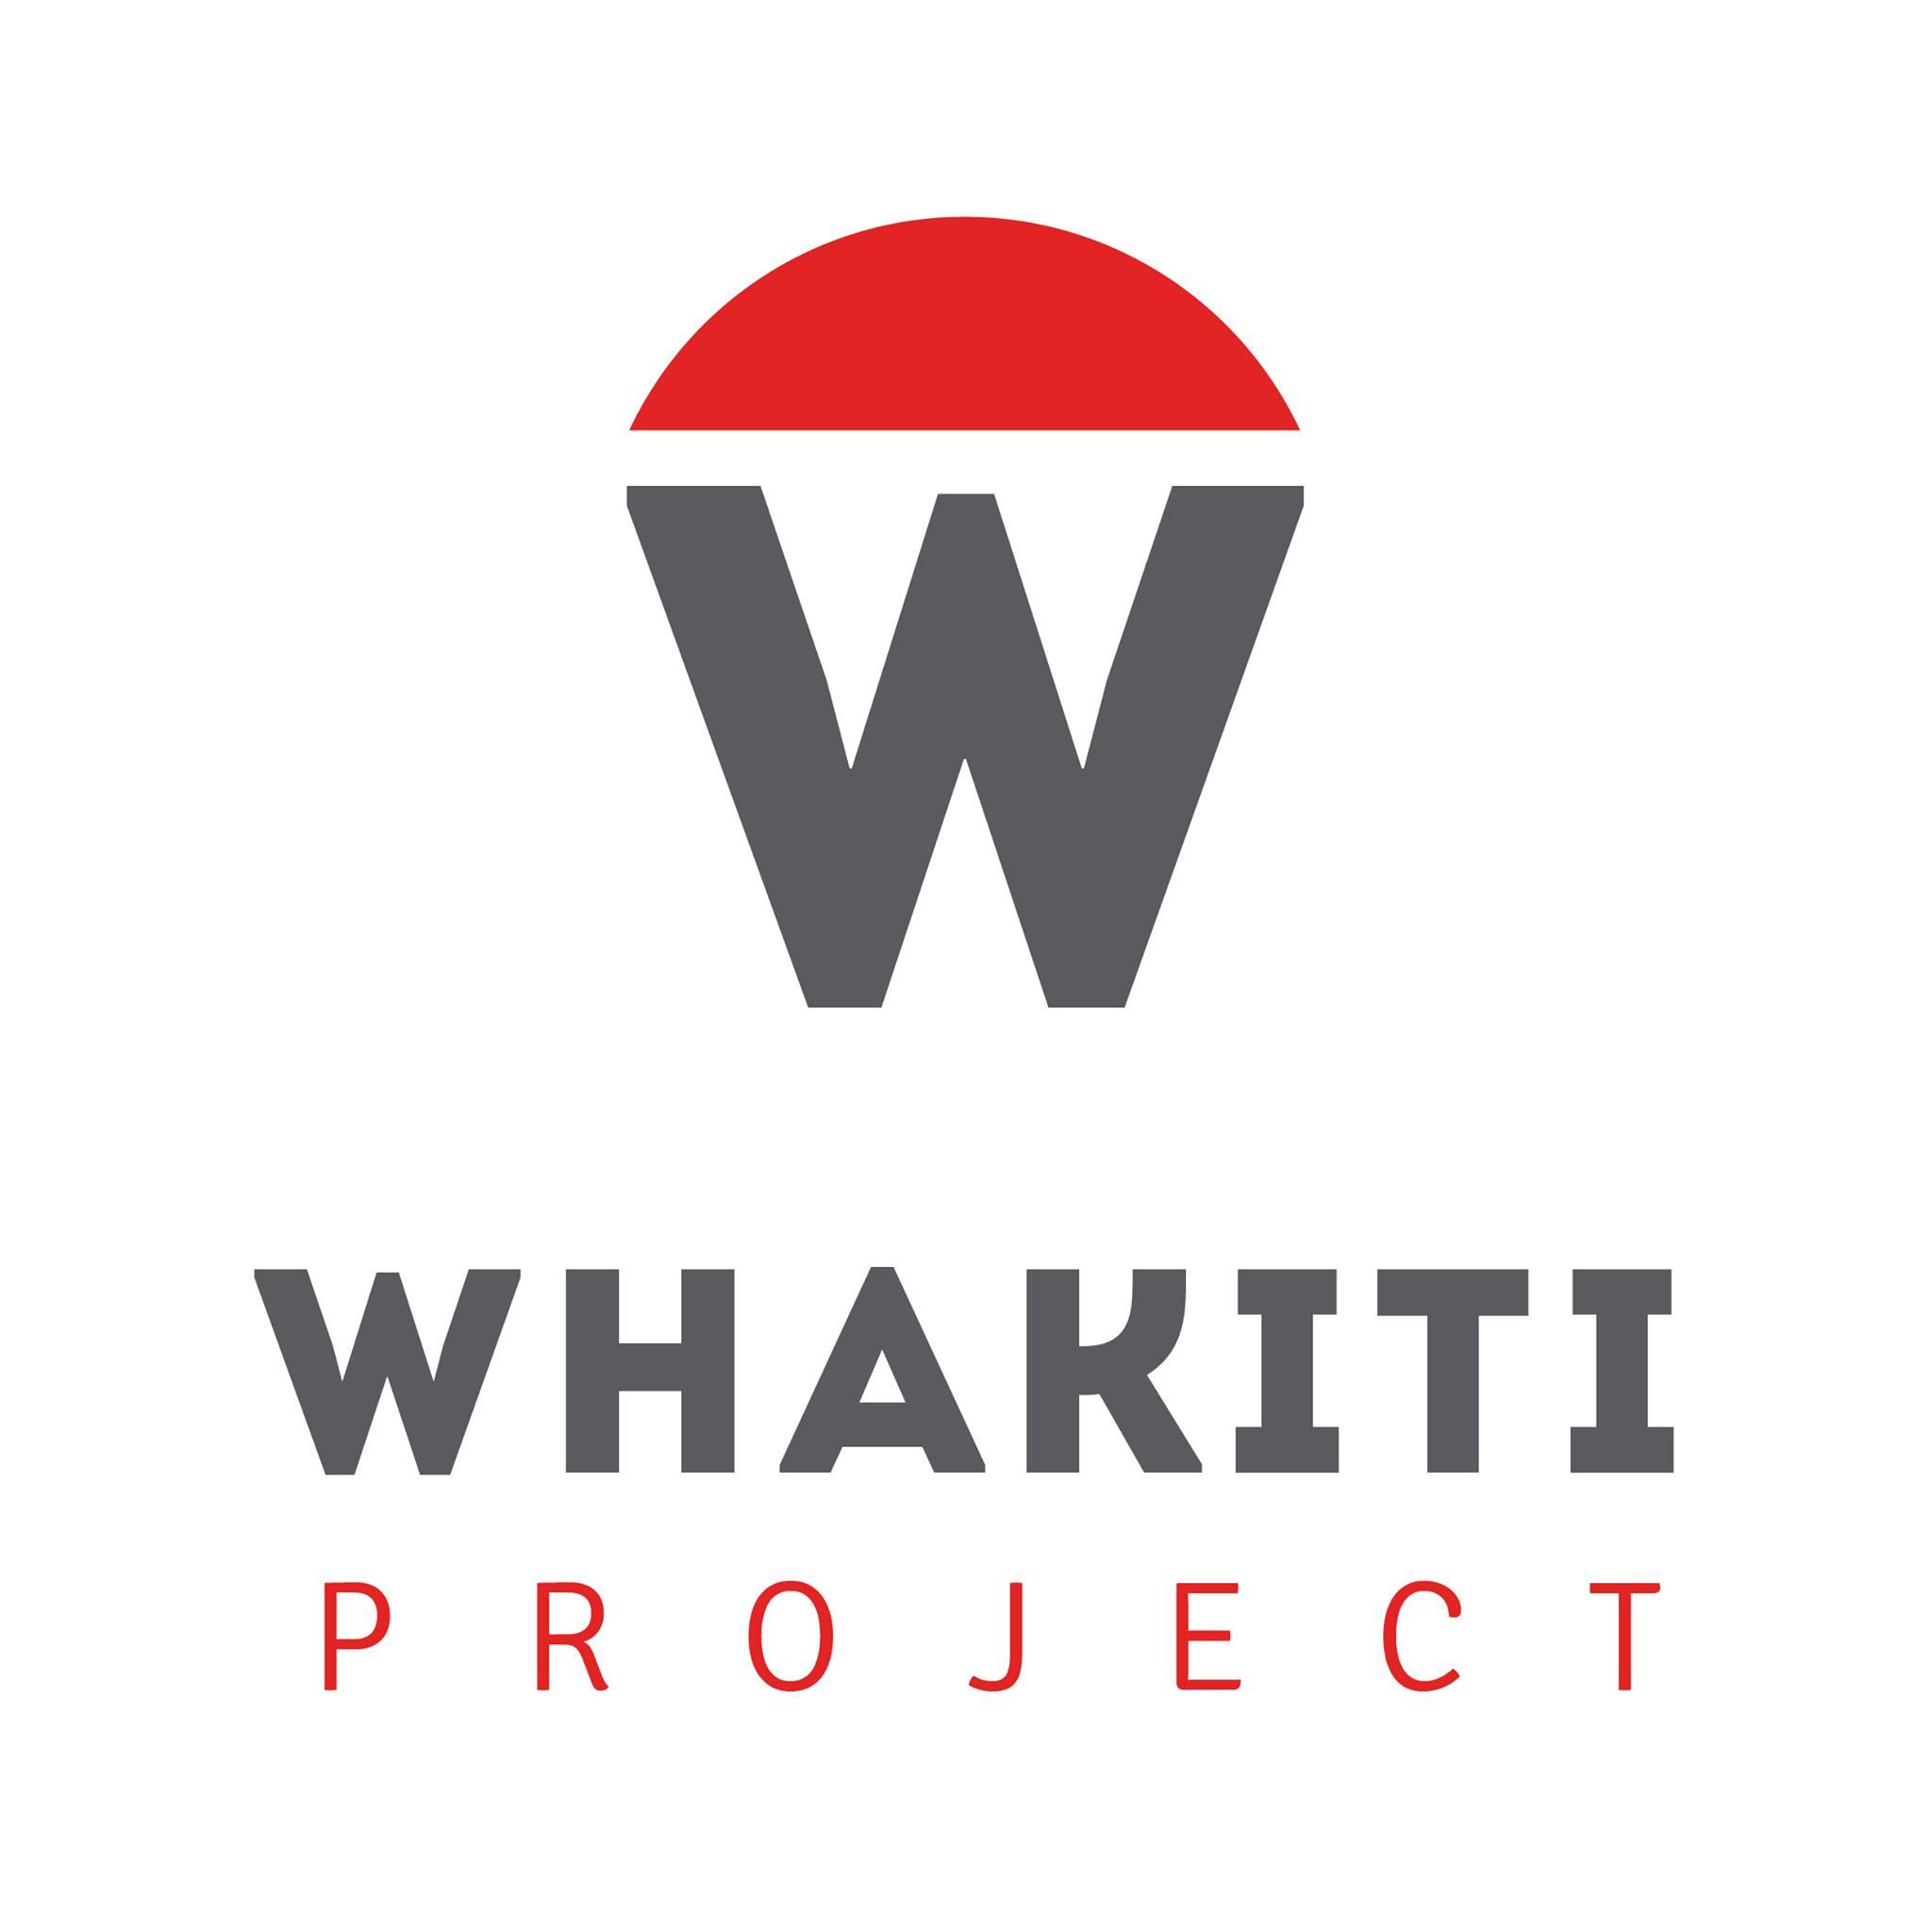 Whakiti-Asta in vista!